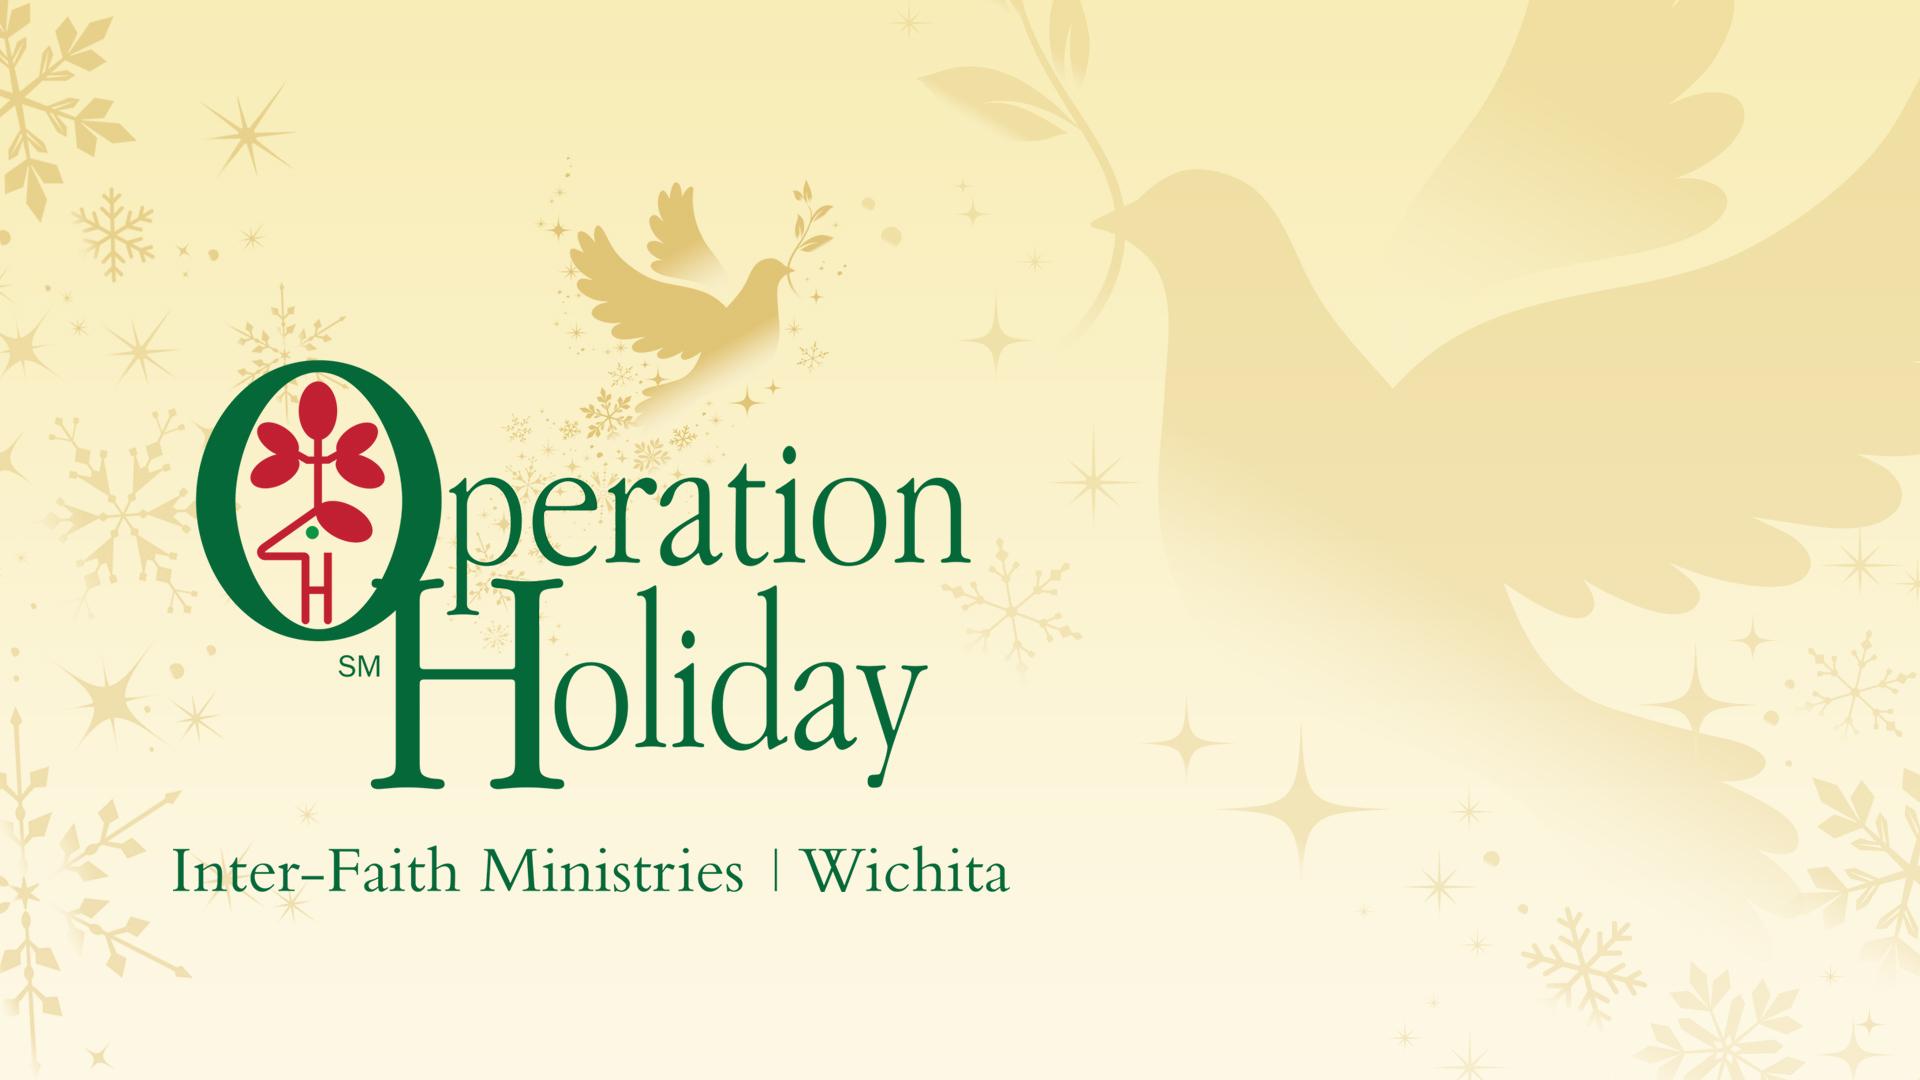 CK Wall Operation Holiday_1544393857944.jpg.jpg